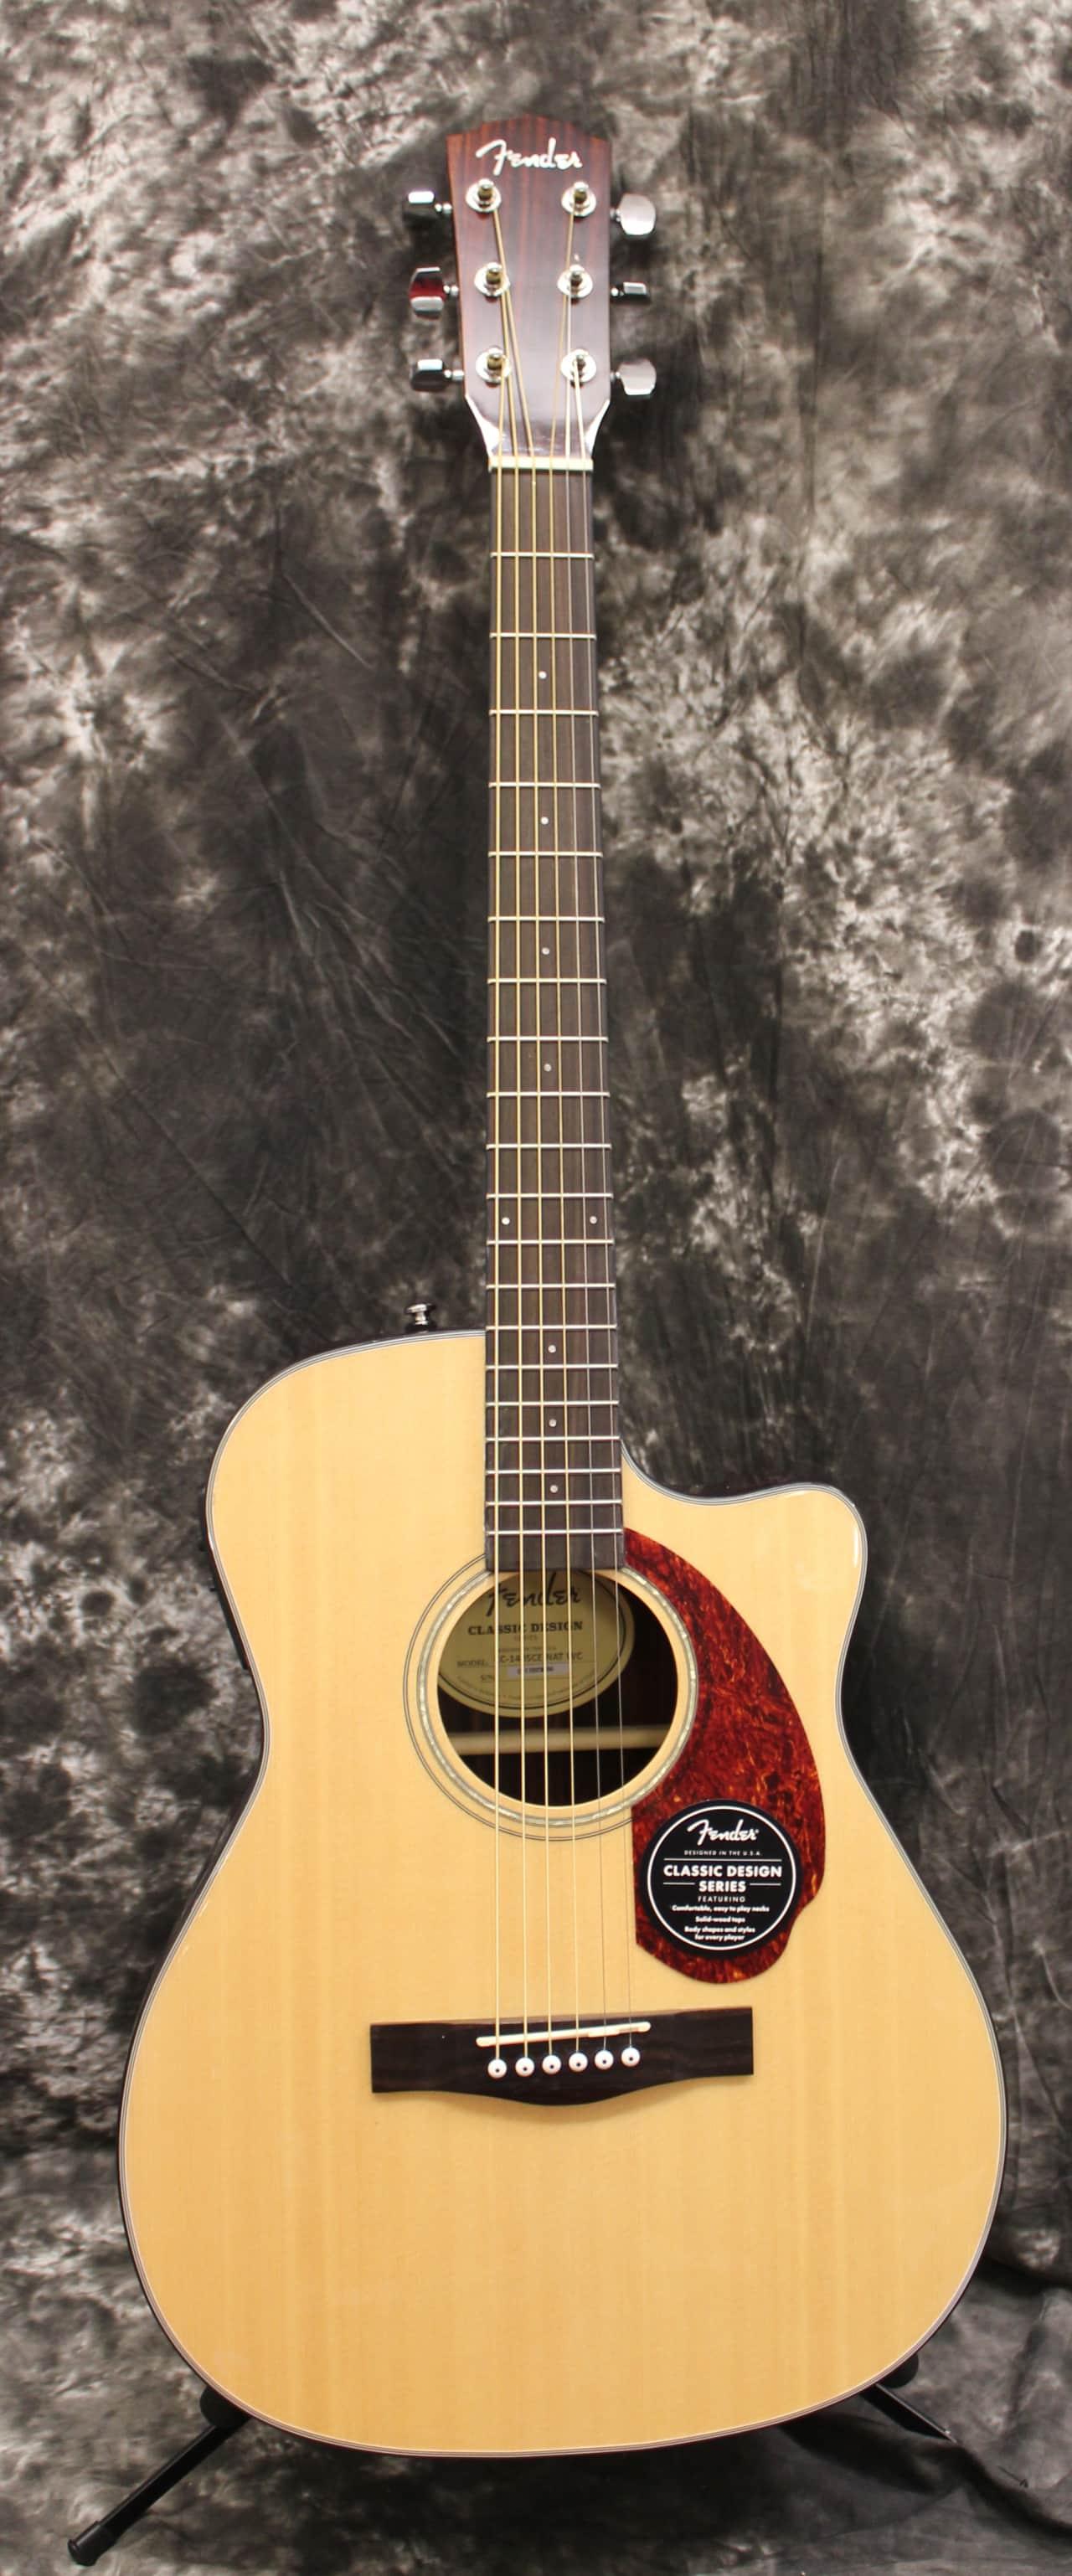 fender cc140sce solid top acoustic electric guitar natural. Black Bedroom Furniture Sets. Home Design Ideas